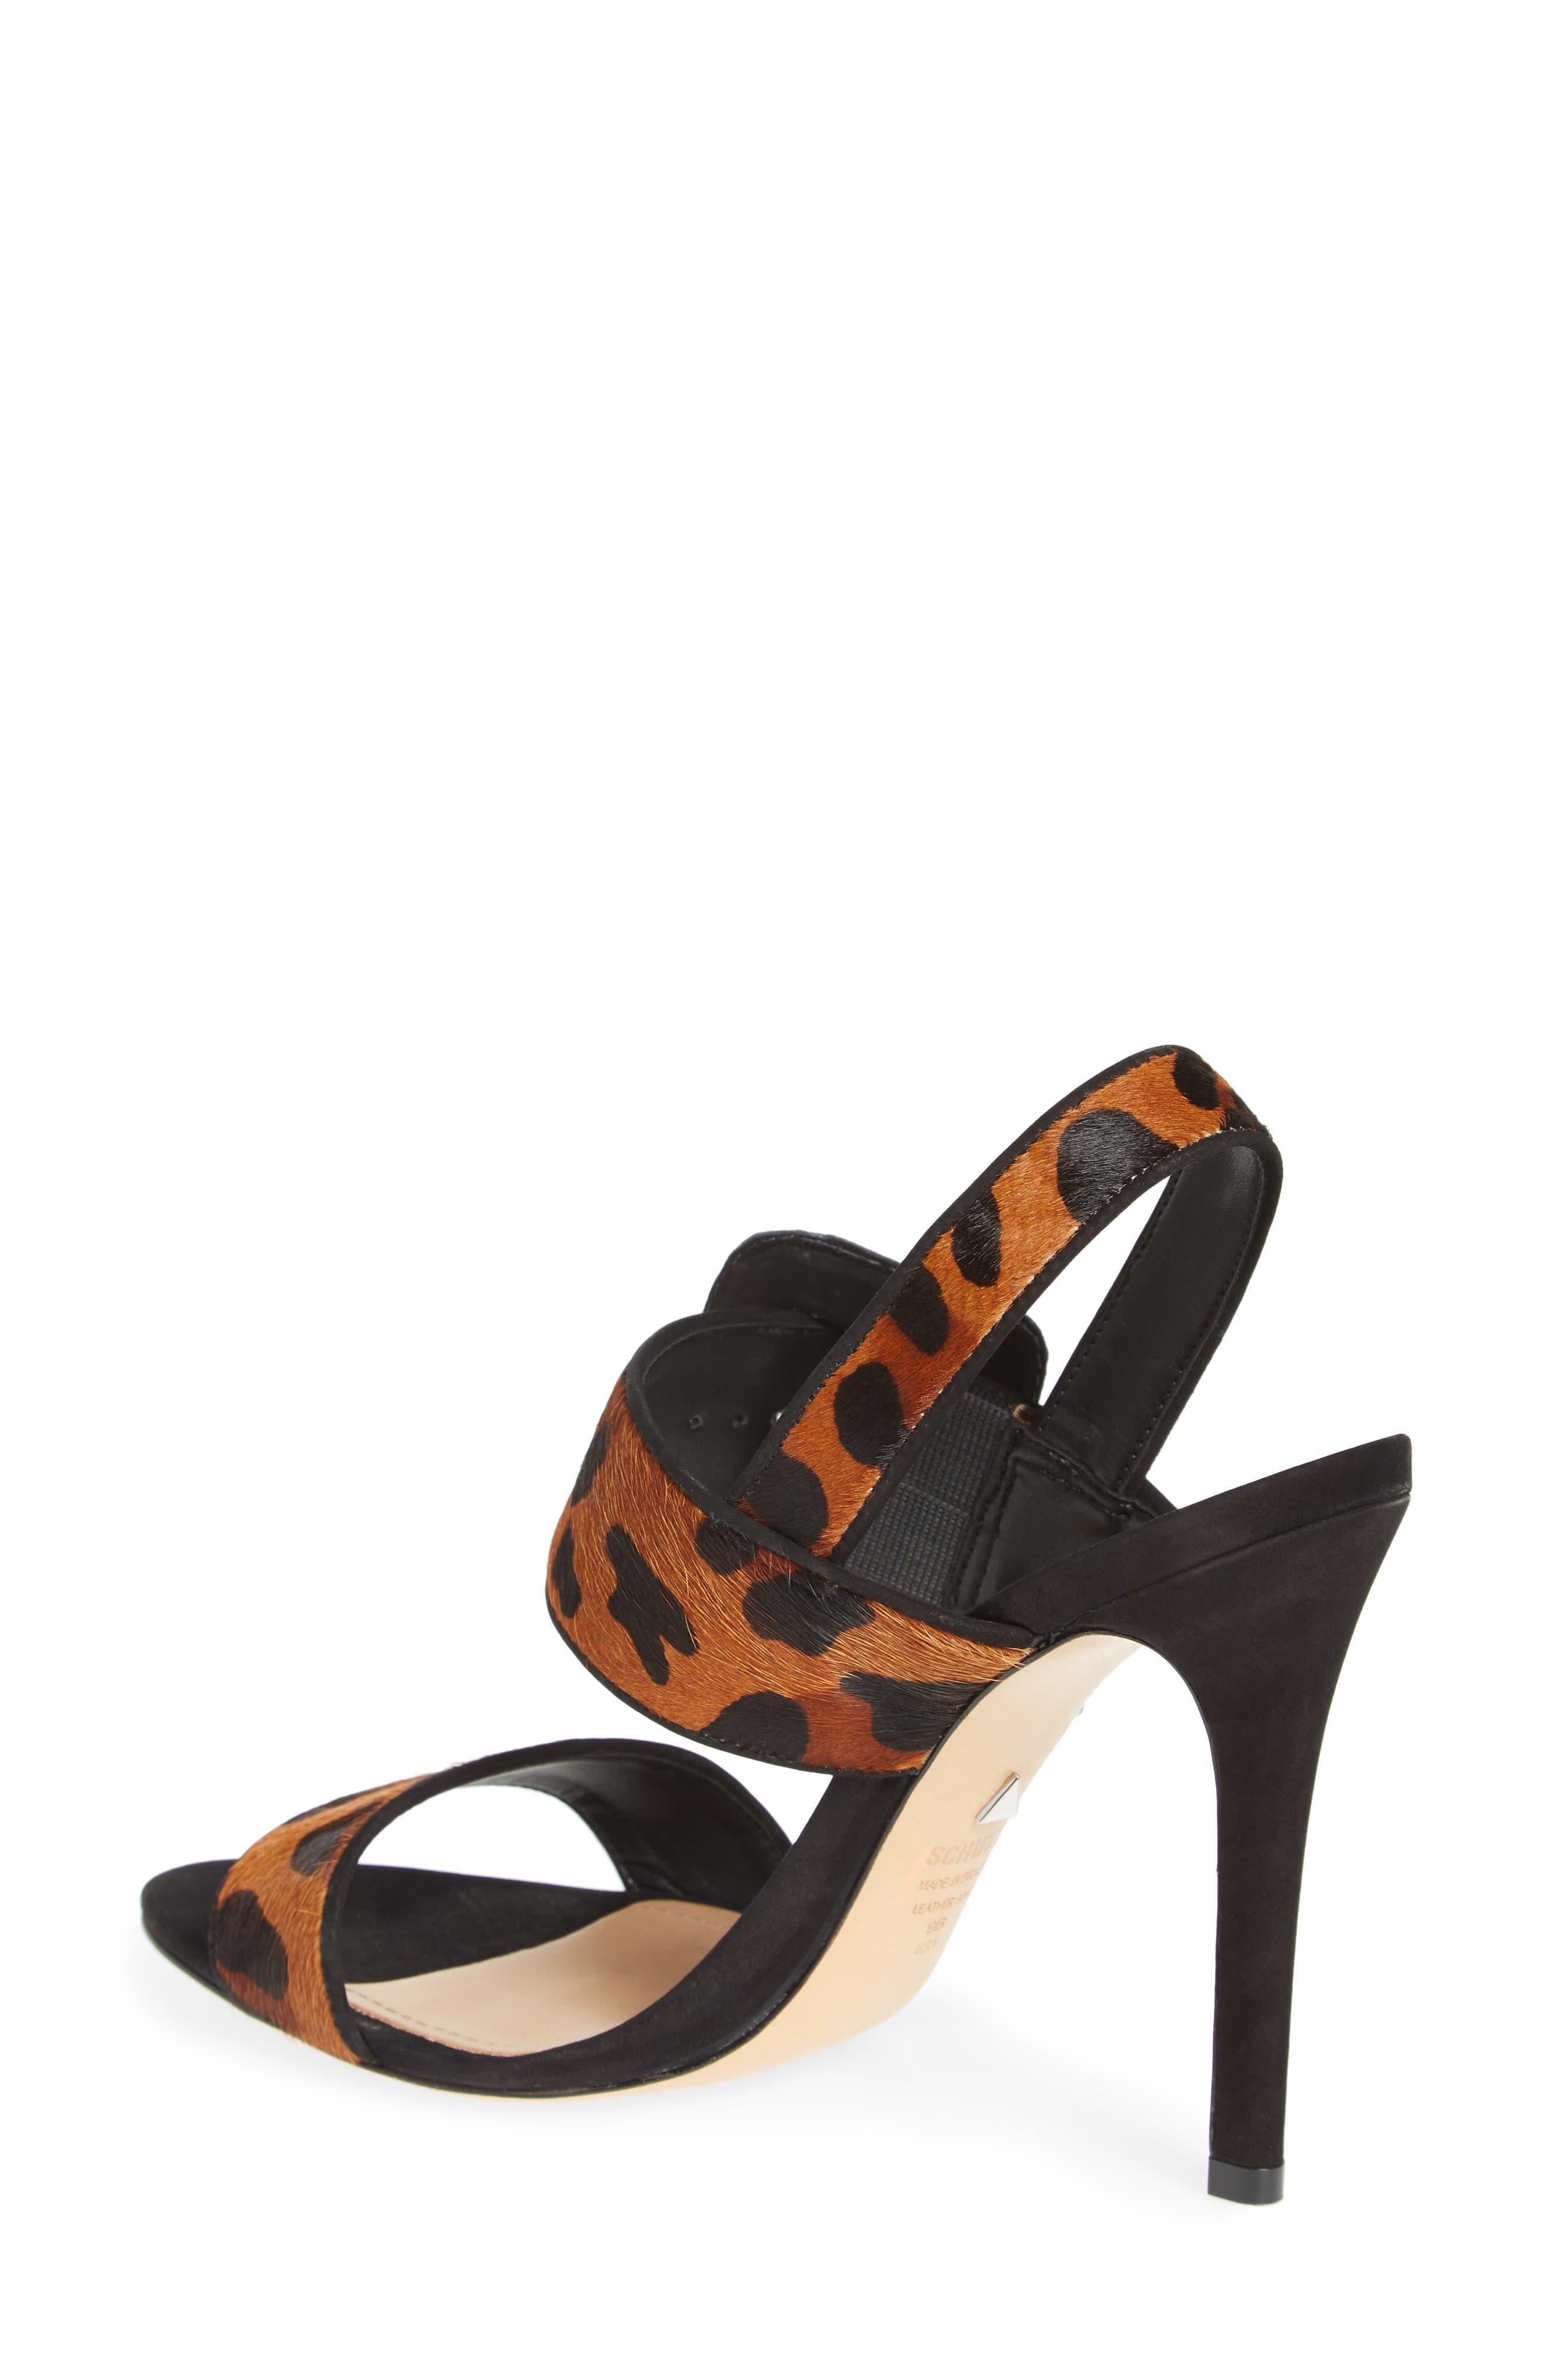 Lucci Genuine Calf Hair Sandal,                             Alternate thumbnail 2, color,                             NATURAL/ BLACK